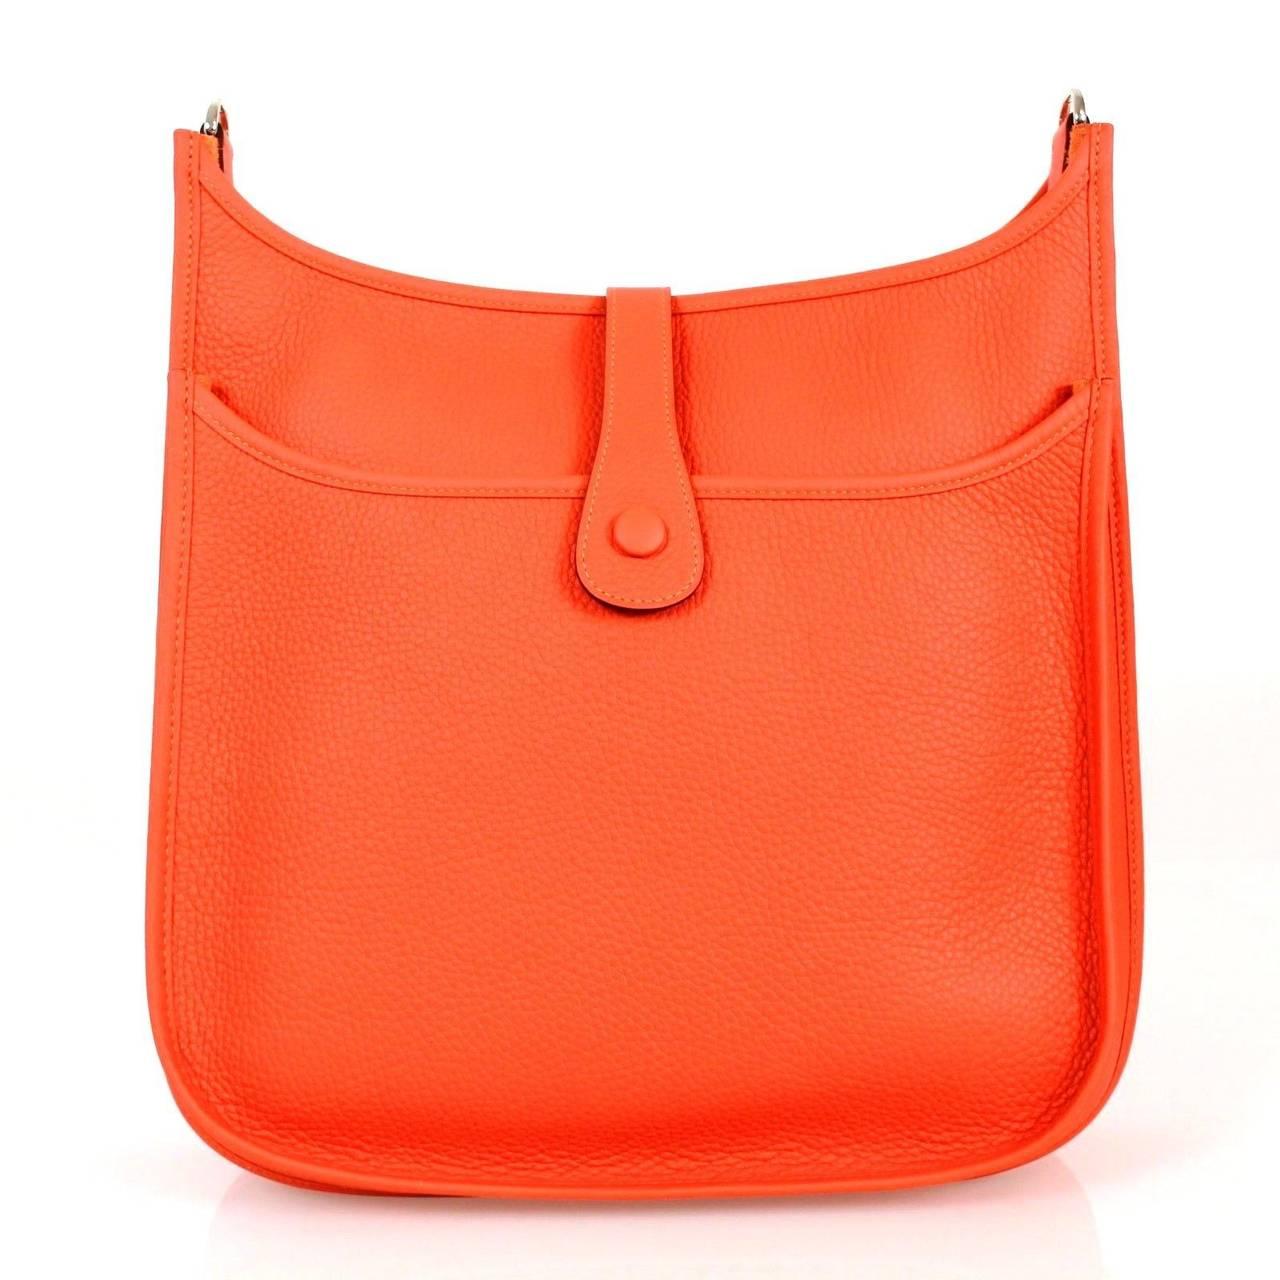 ... Orange Taurillon Clemence Leather 2015 Evelyne Iii Gm Cross Body Bag